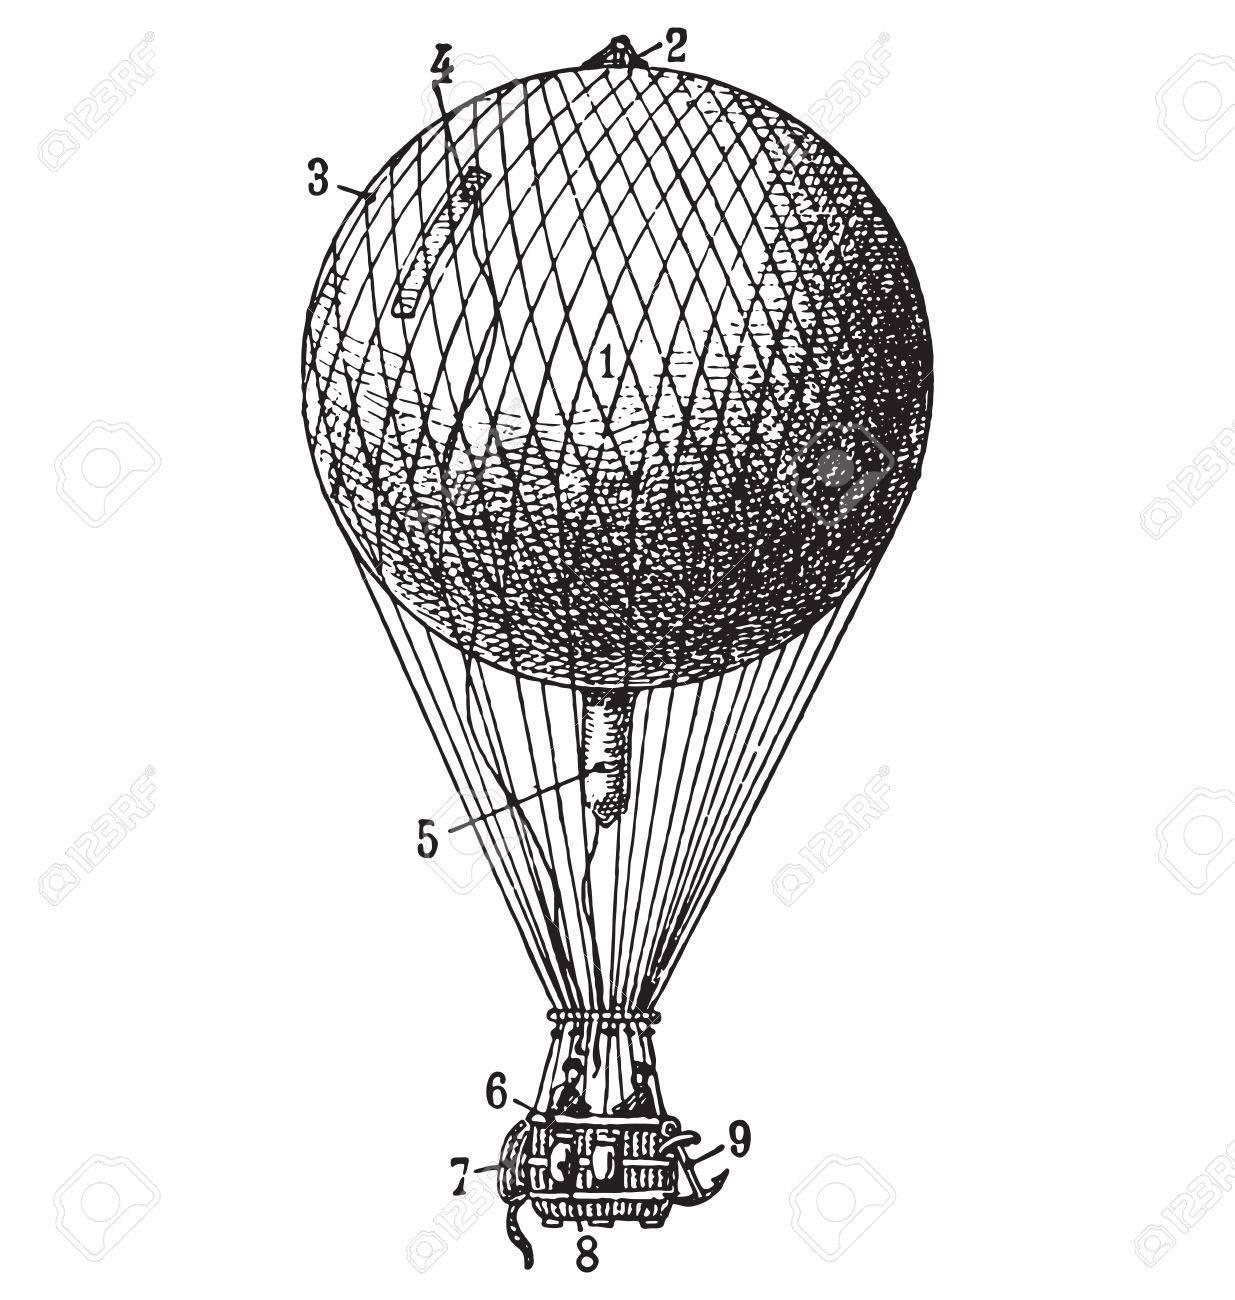 Vintage Air Balloon Royalty Free Cliparts, Vectors, And Stock ...